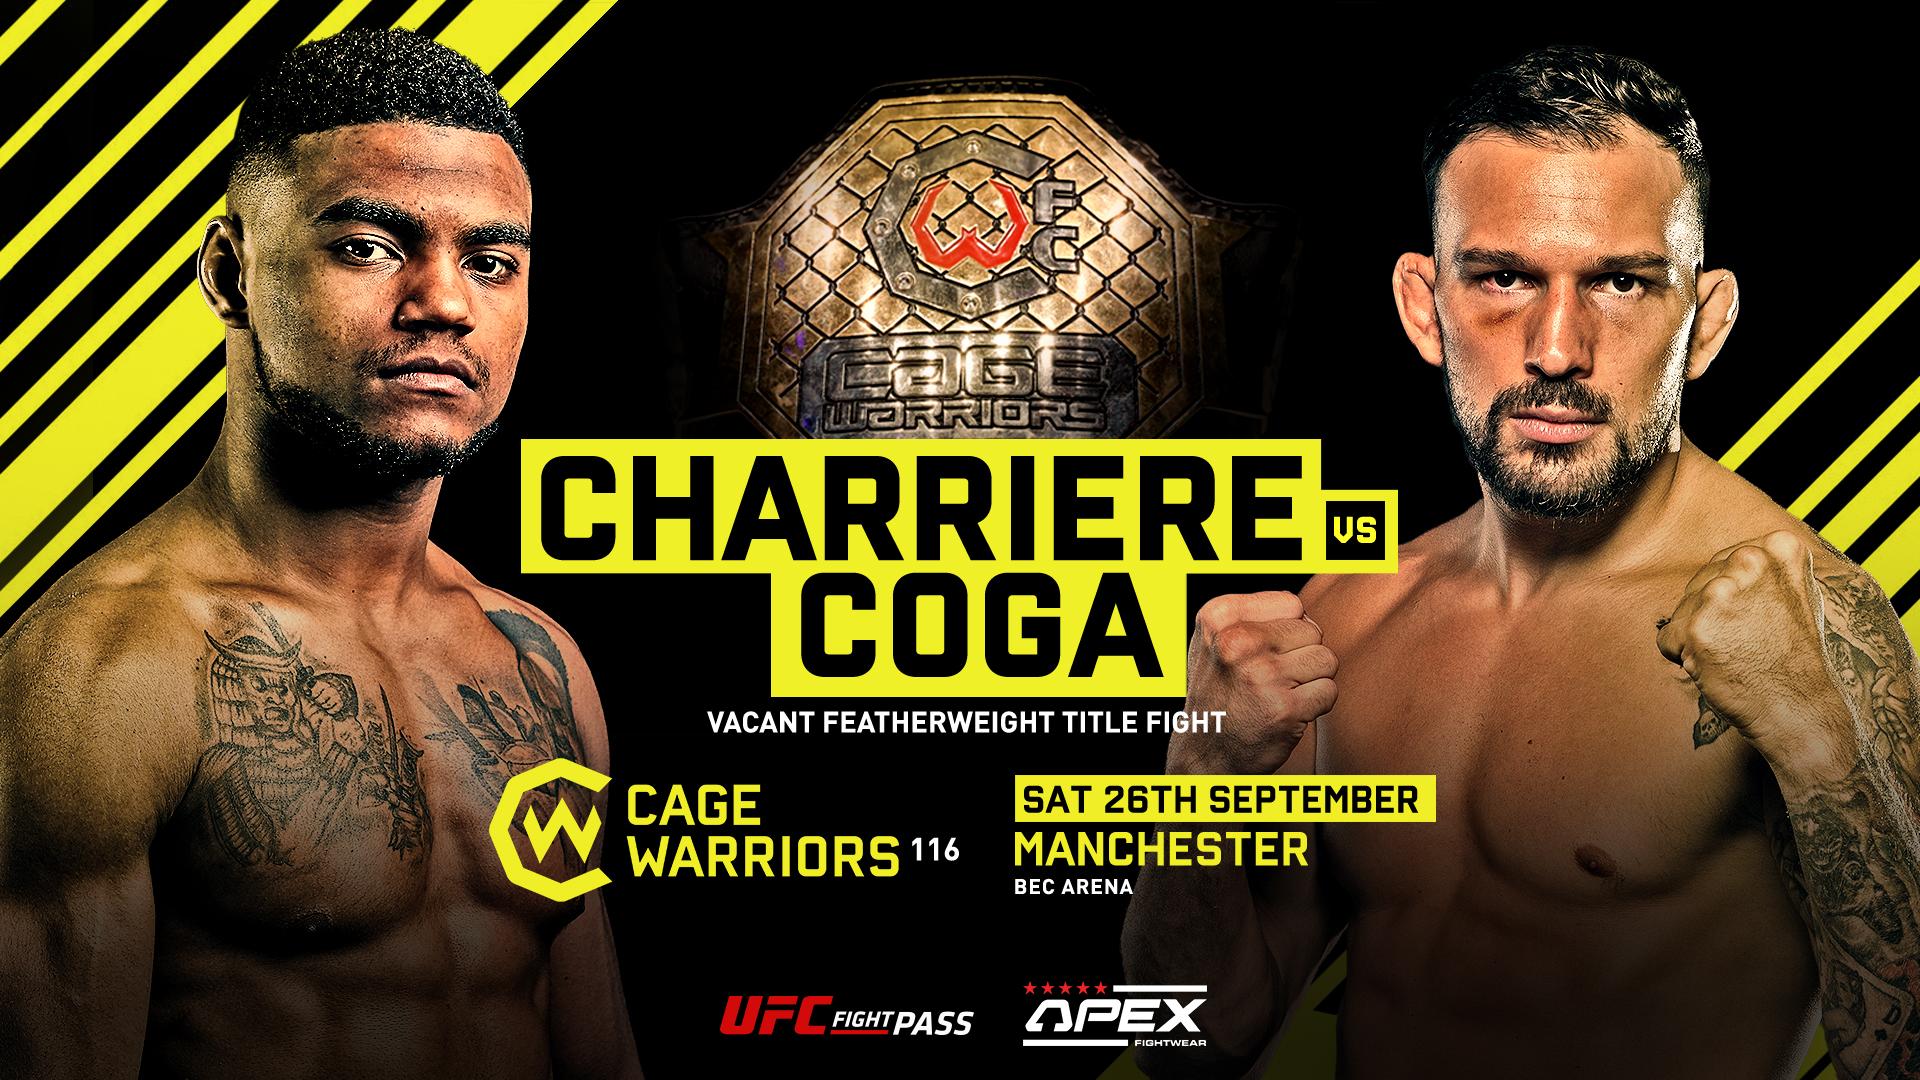 Cage Warriors 116 – Charrière vs Coga Announced